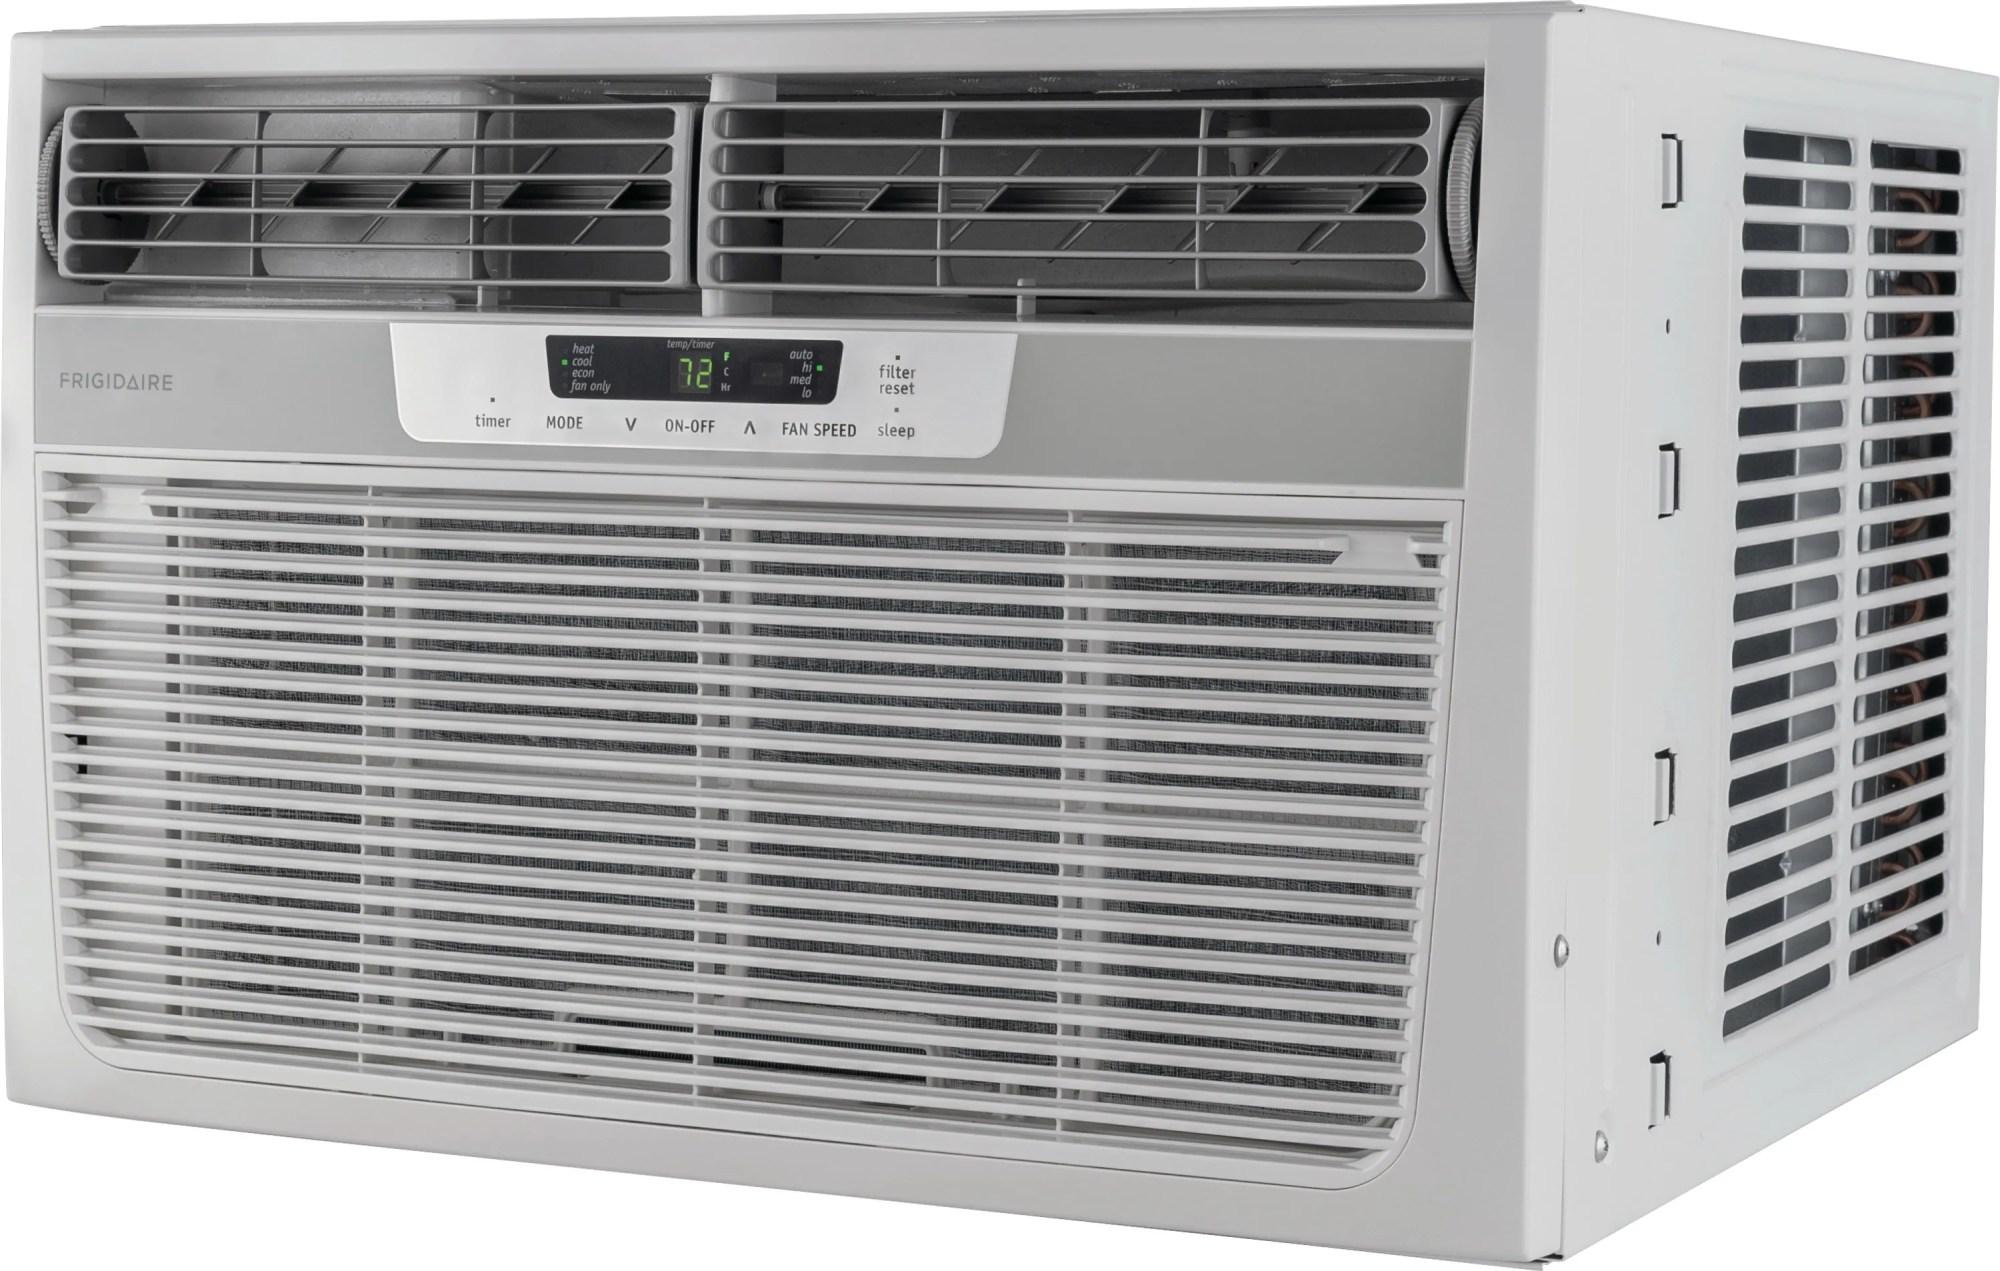 hight resolution of frigidaire heat pump wiring diagram